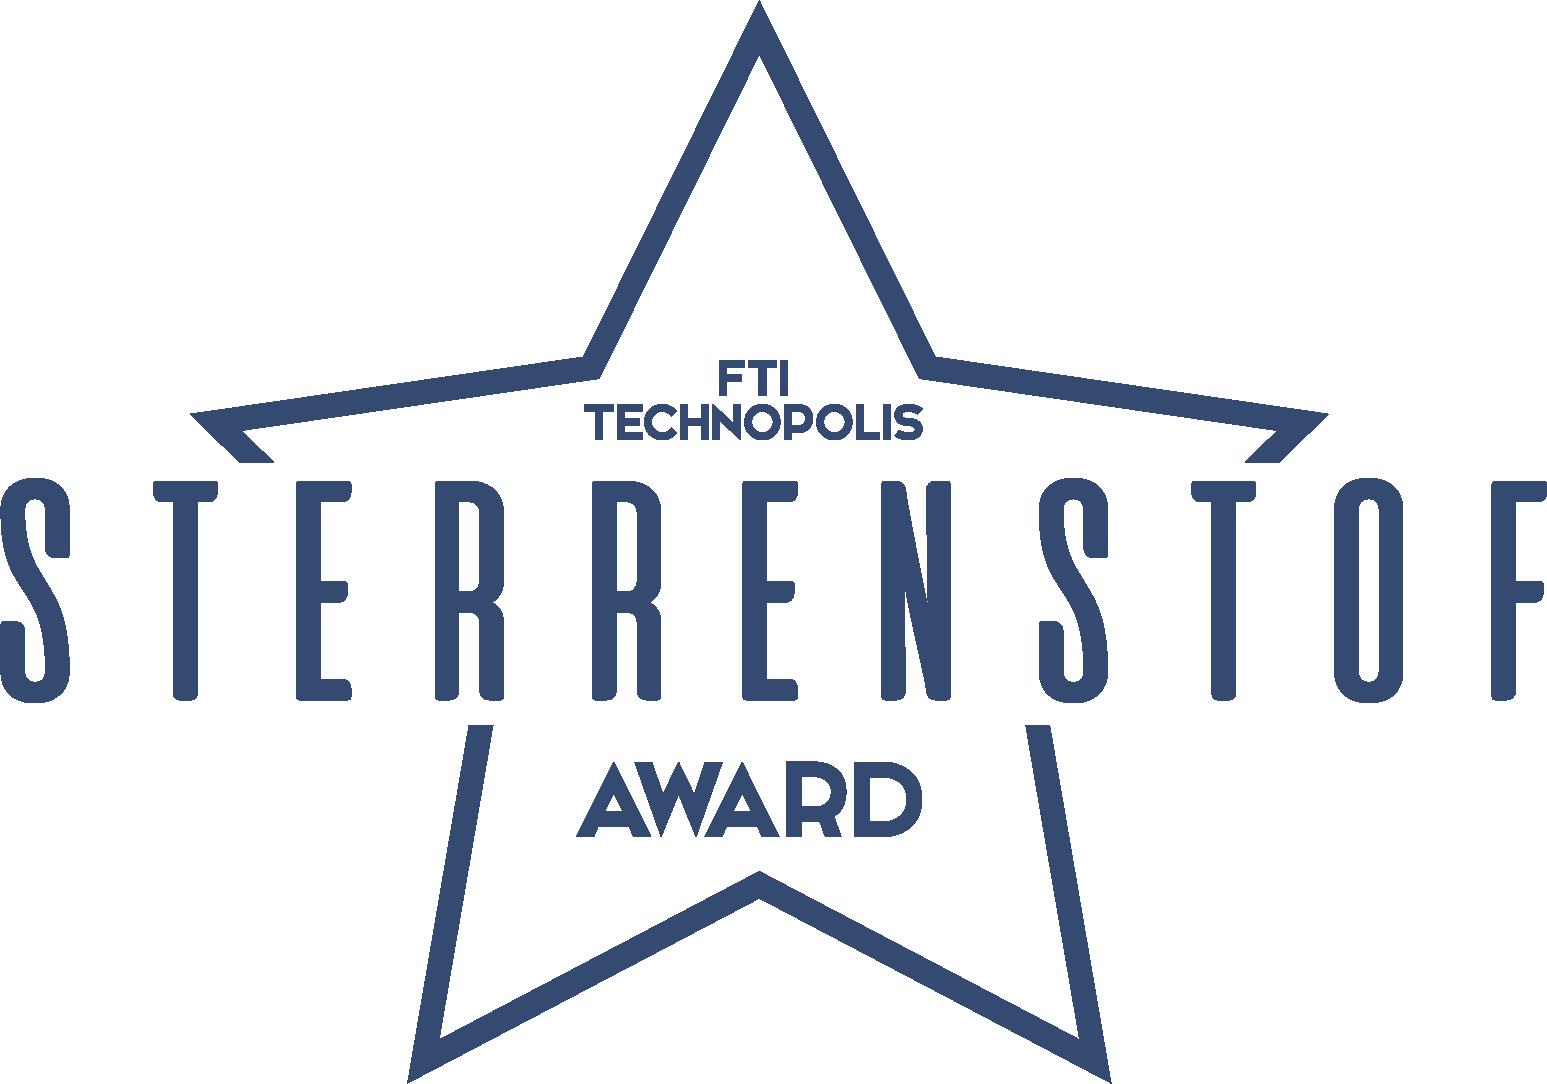 FTI Technopolis Sterrenstof award donkerblauw